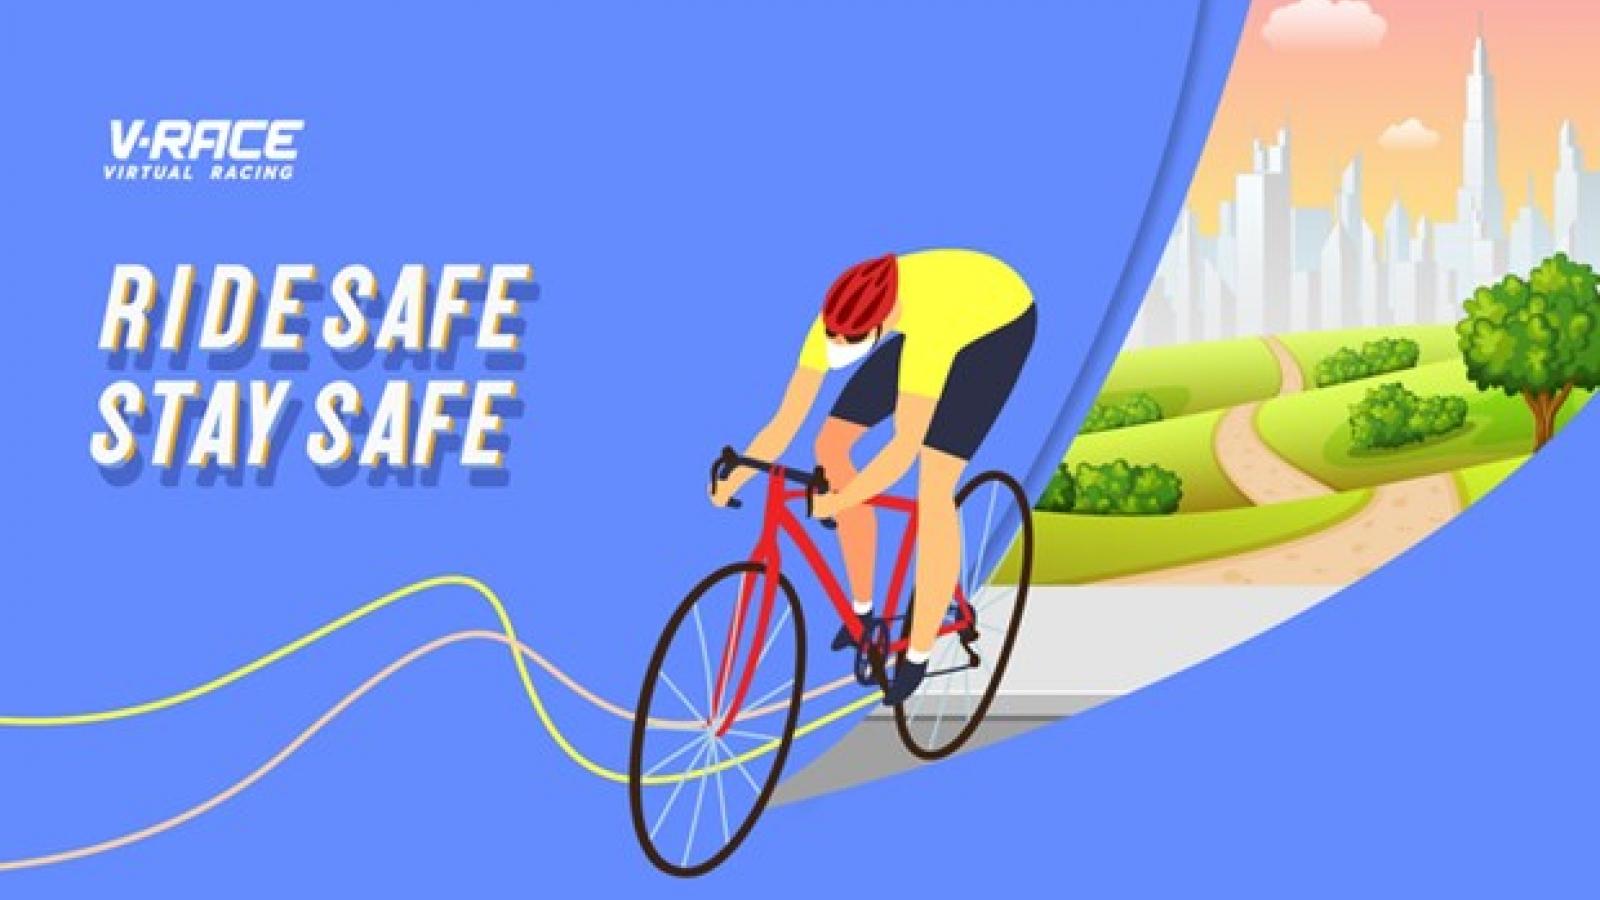 First-ever virtual cycling race held on V-race platform